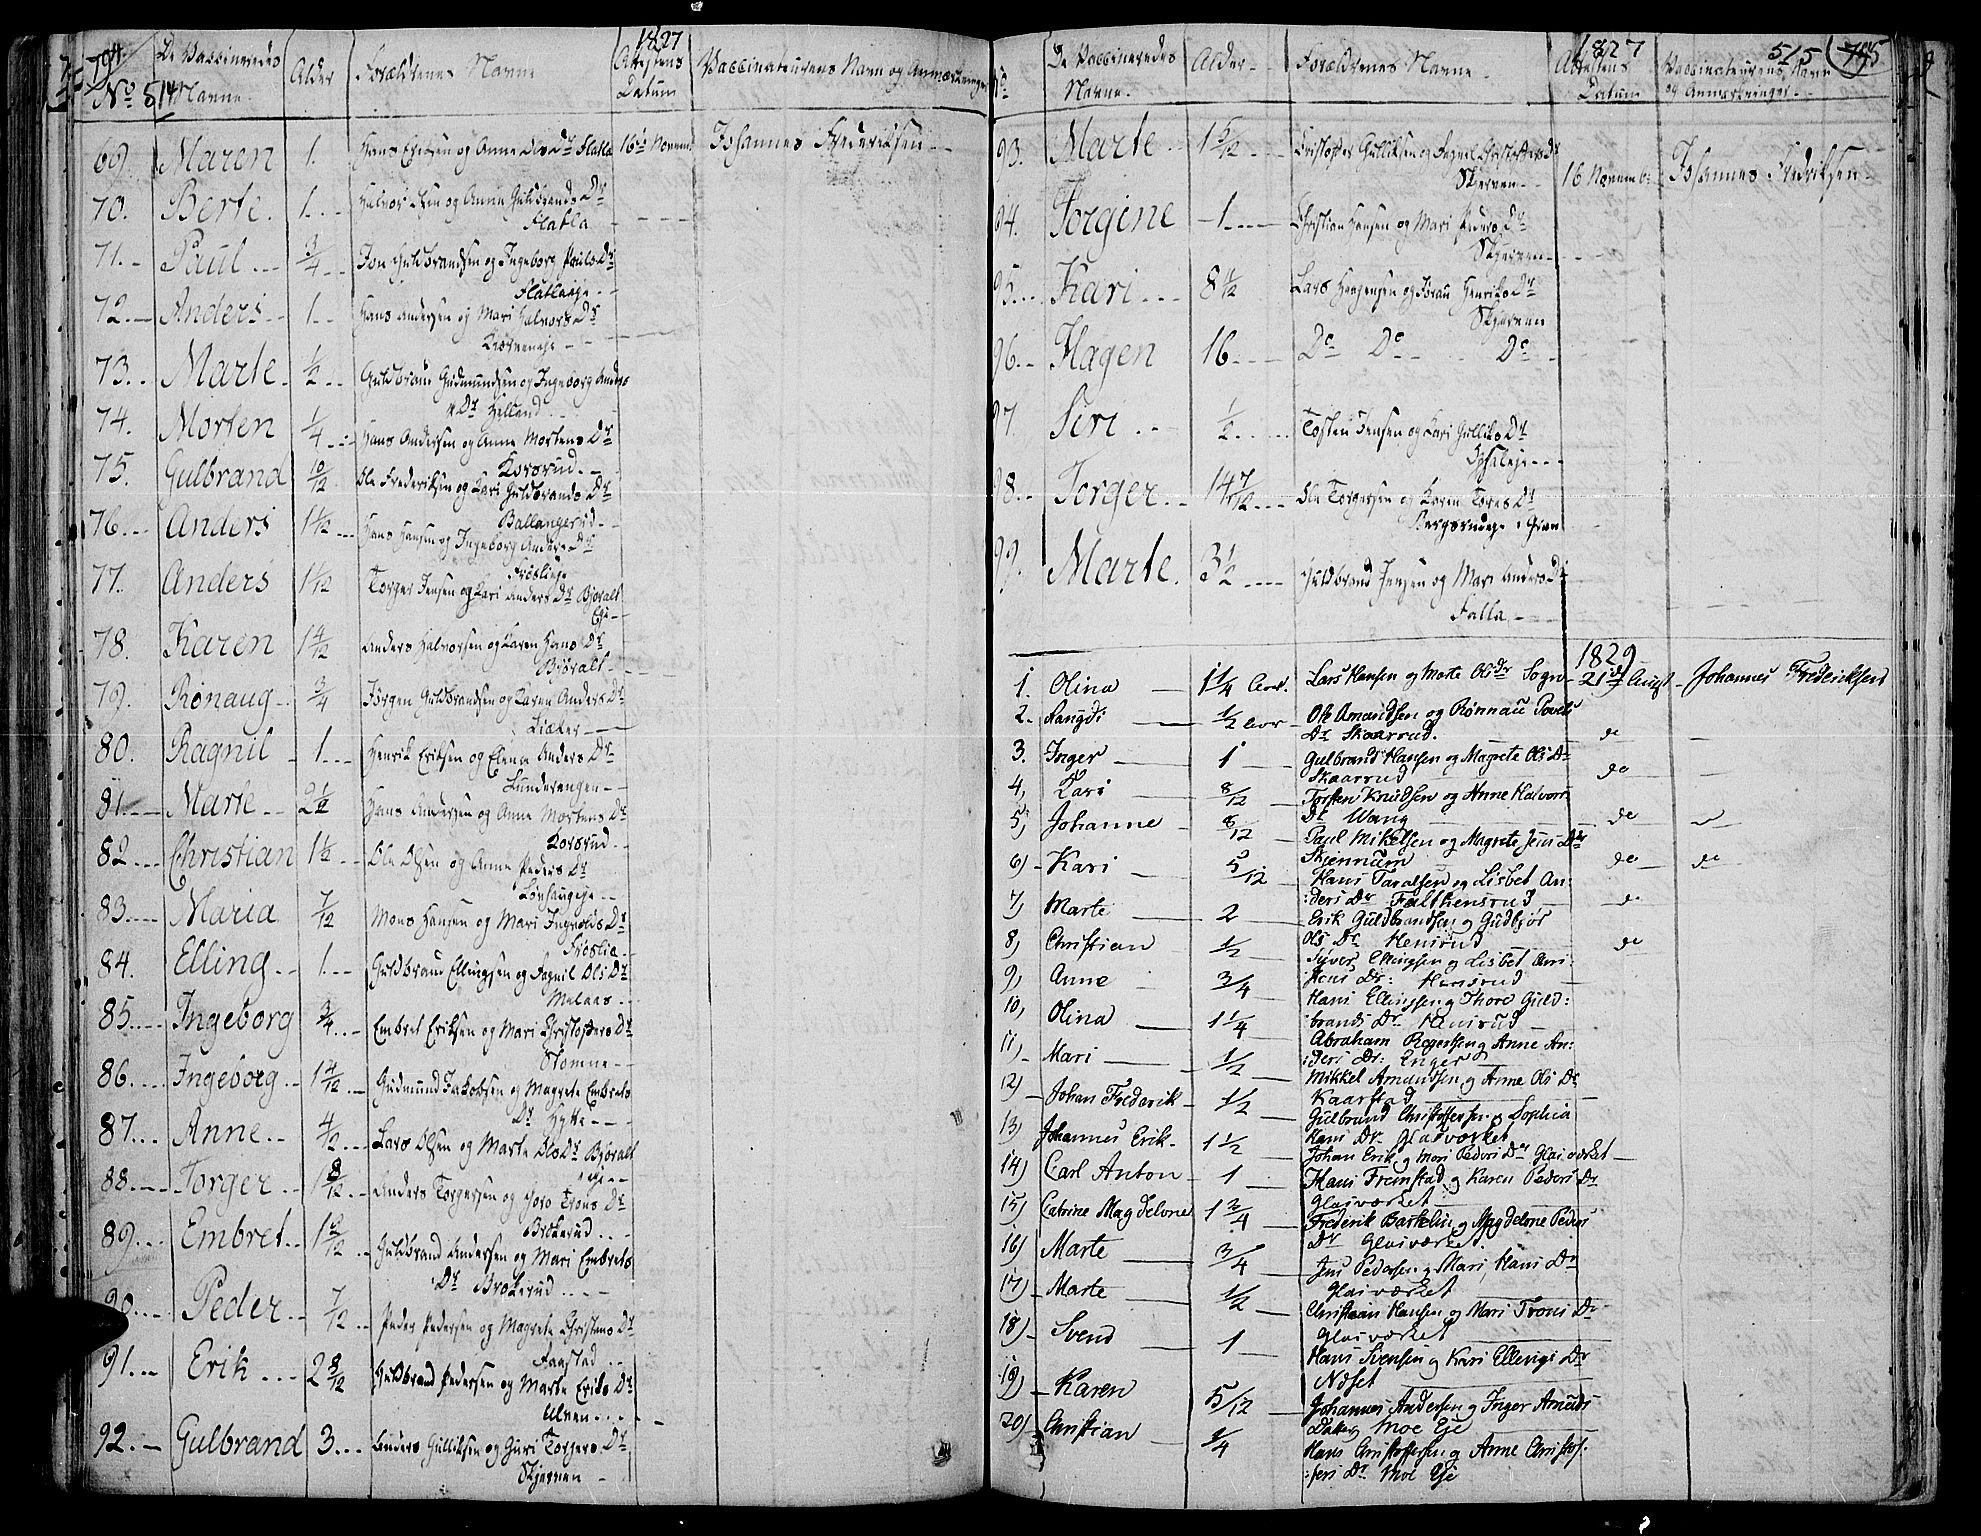 SAH, Jevnaker prestekontor, Ministerialbok nr. 4, 1800-1861, s. 514-515